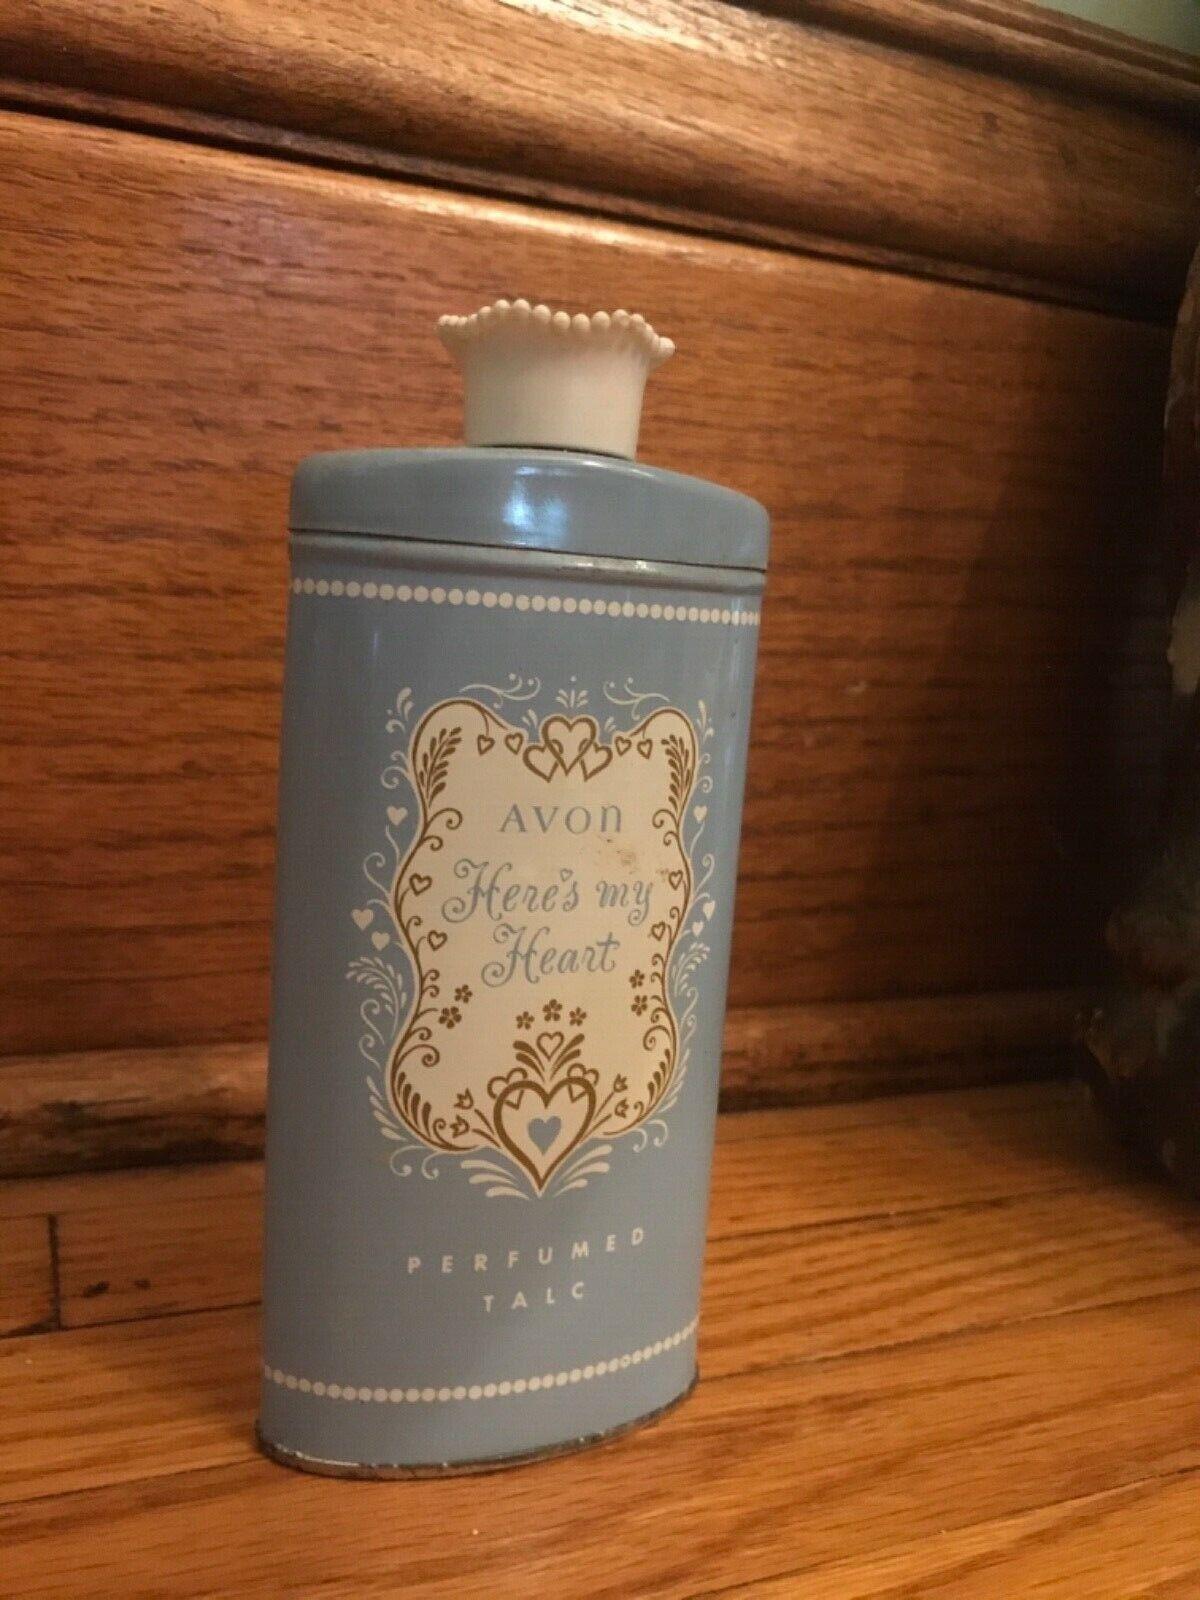 Vintage Avon Here's my Heart 2.75 oz. Perfumed Talc Powder Half Full